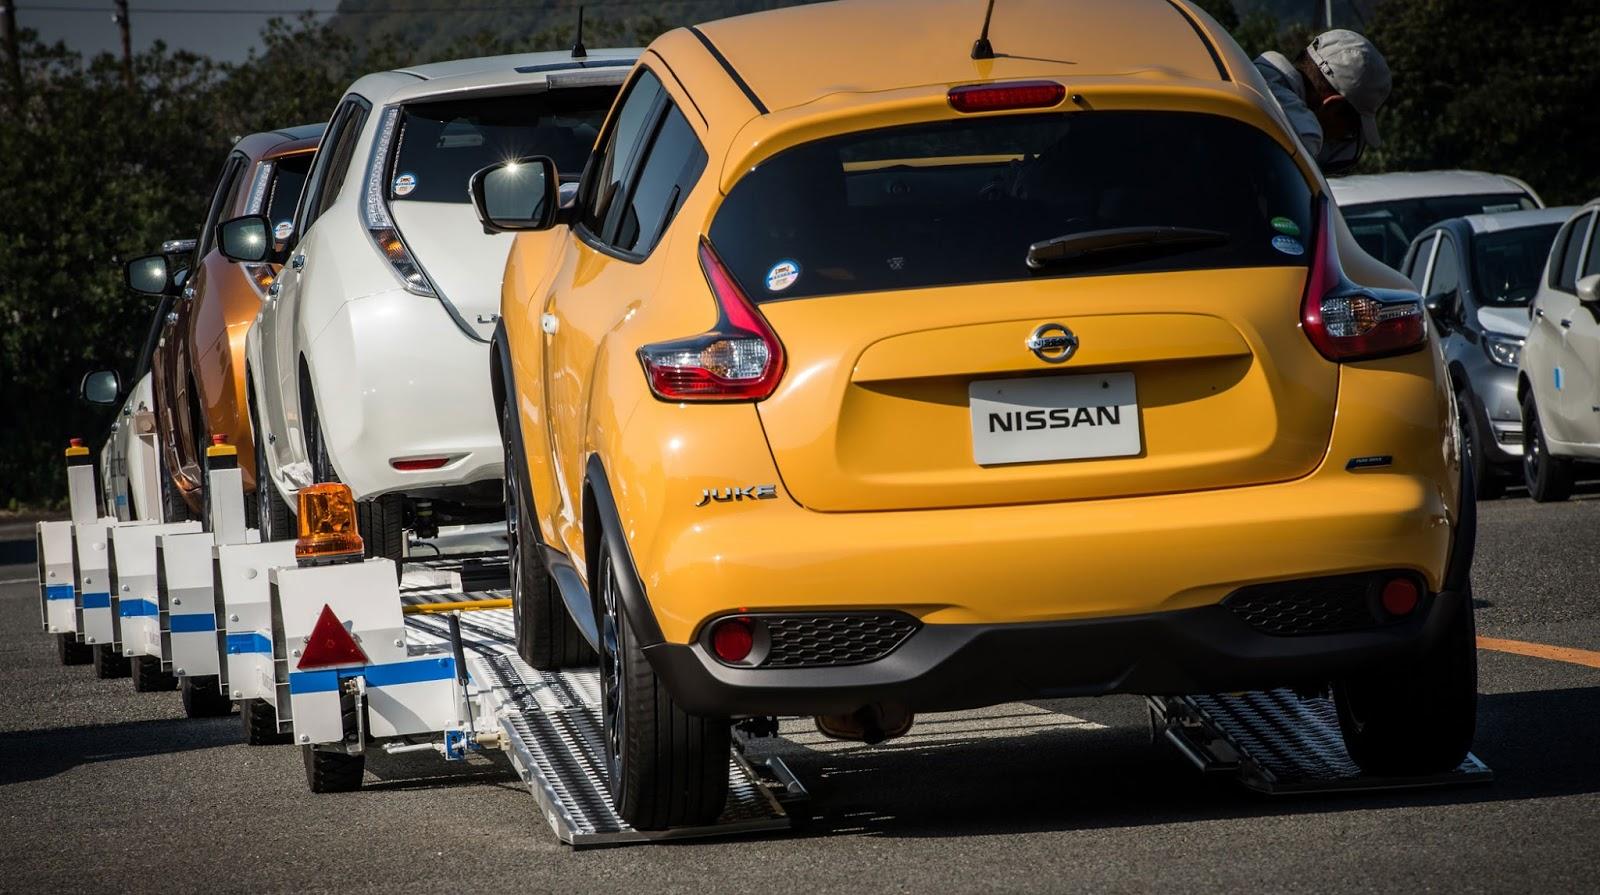 NISSAN Oppama Plant2 BINTEO: Δες το αυτόνομο όχημα ρυμούλκησης που έφτιαξε η Nissan